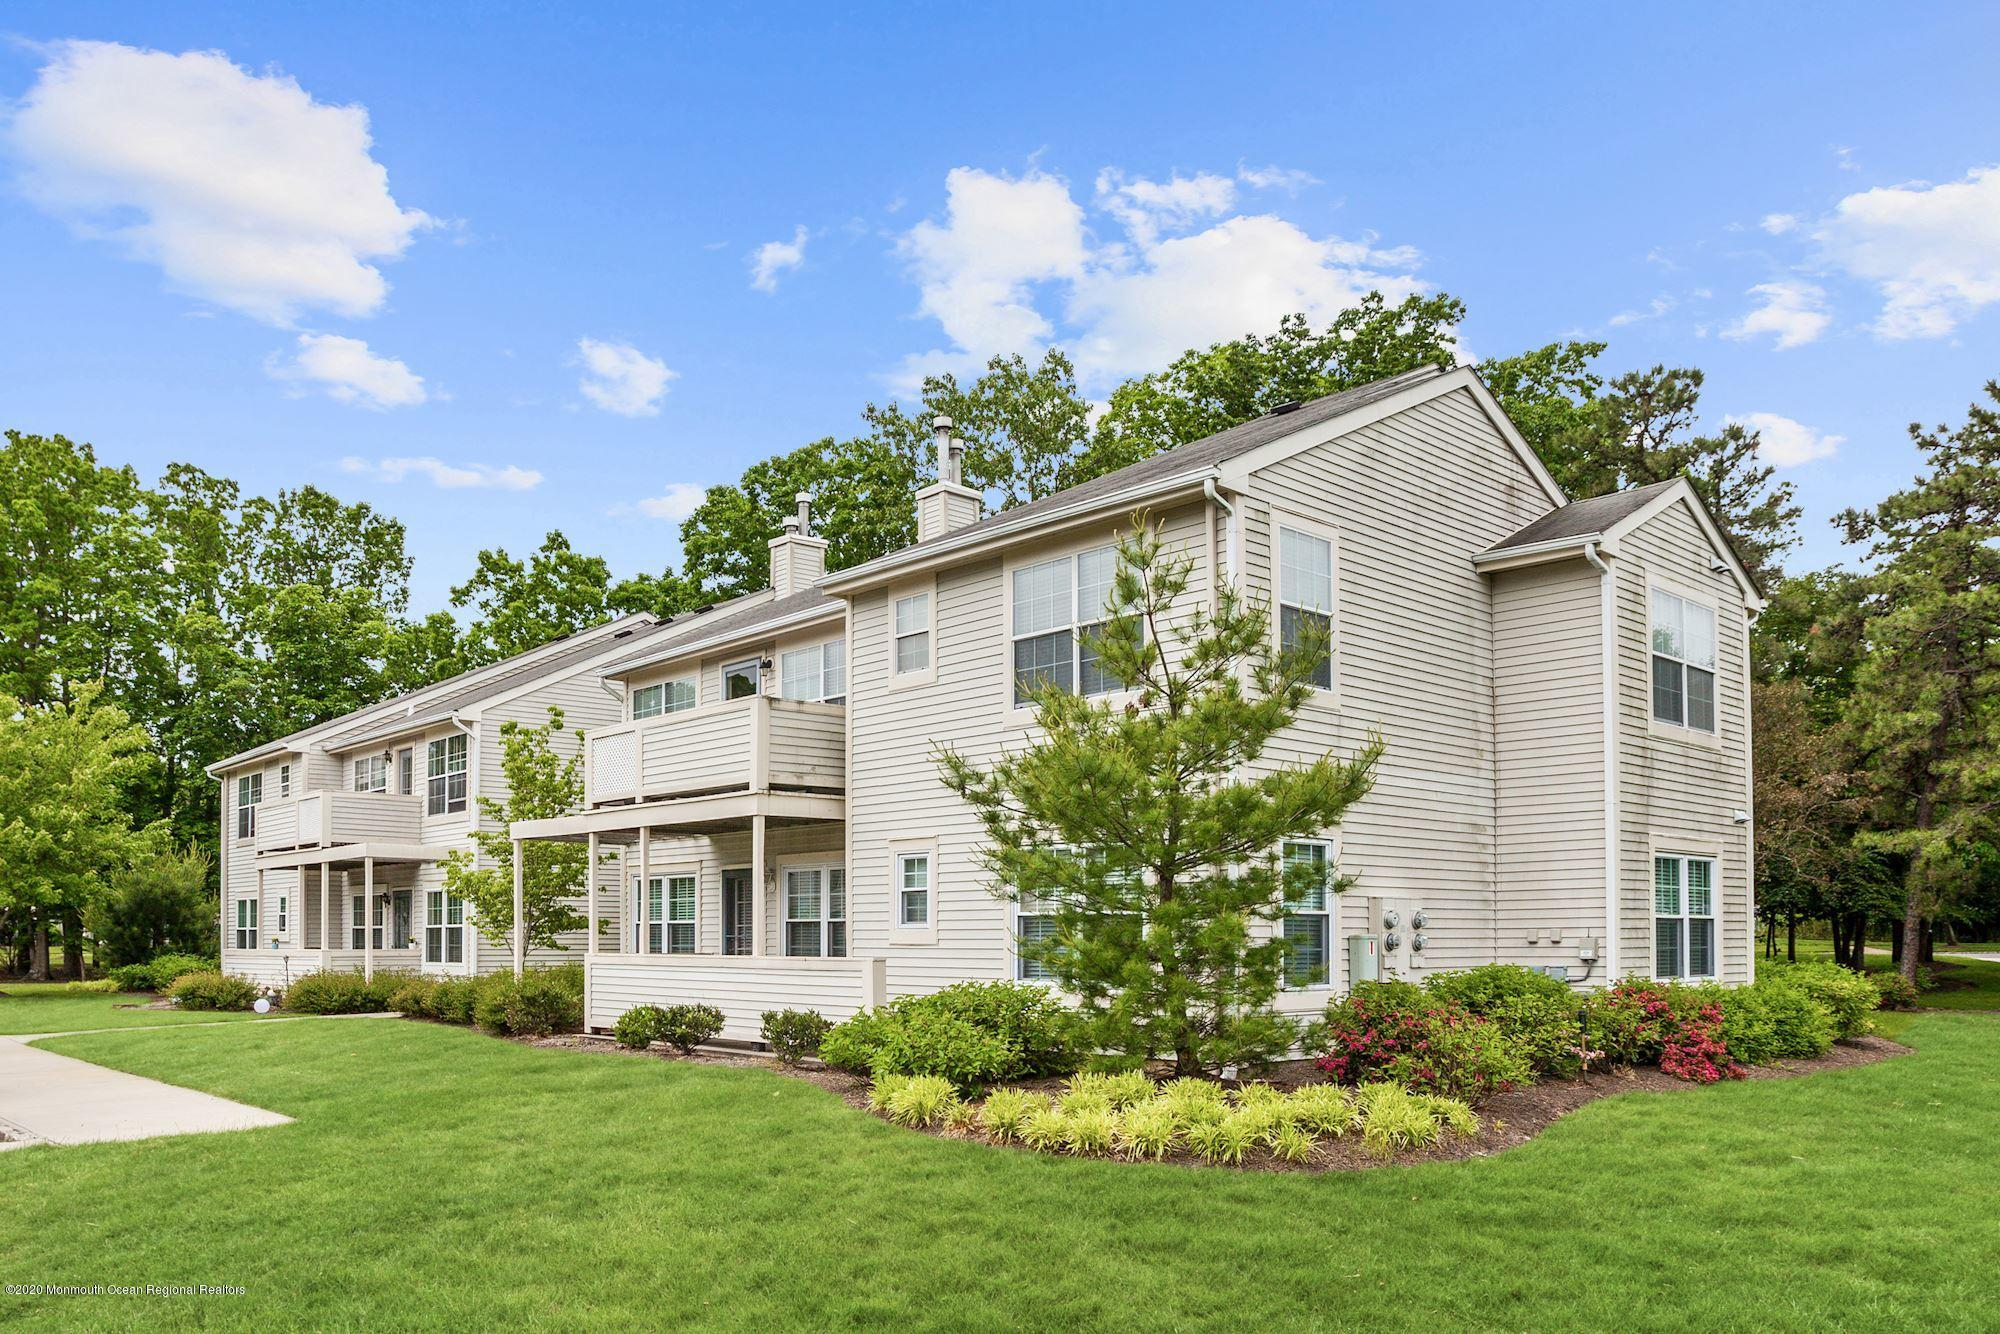 184 Pinetree Court , Howell, NJ 07731